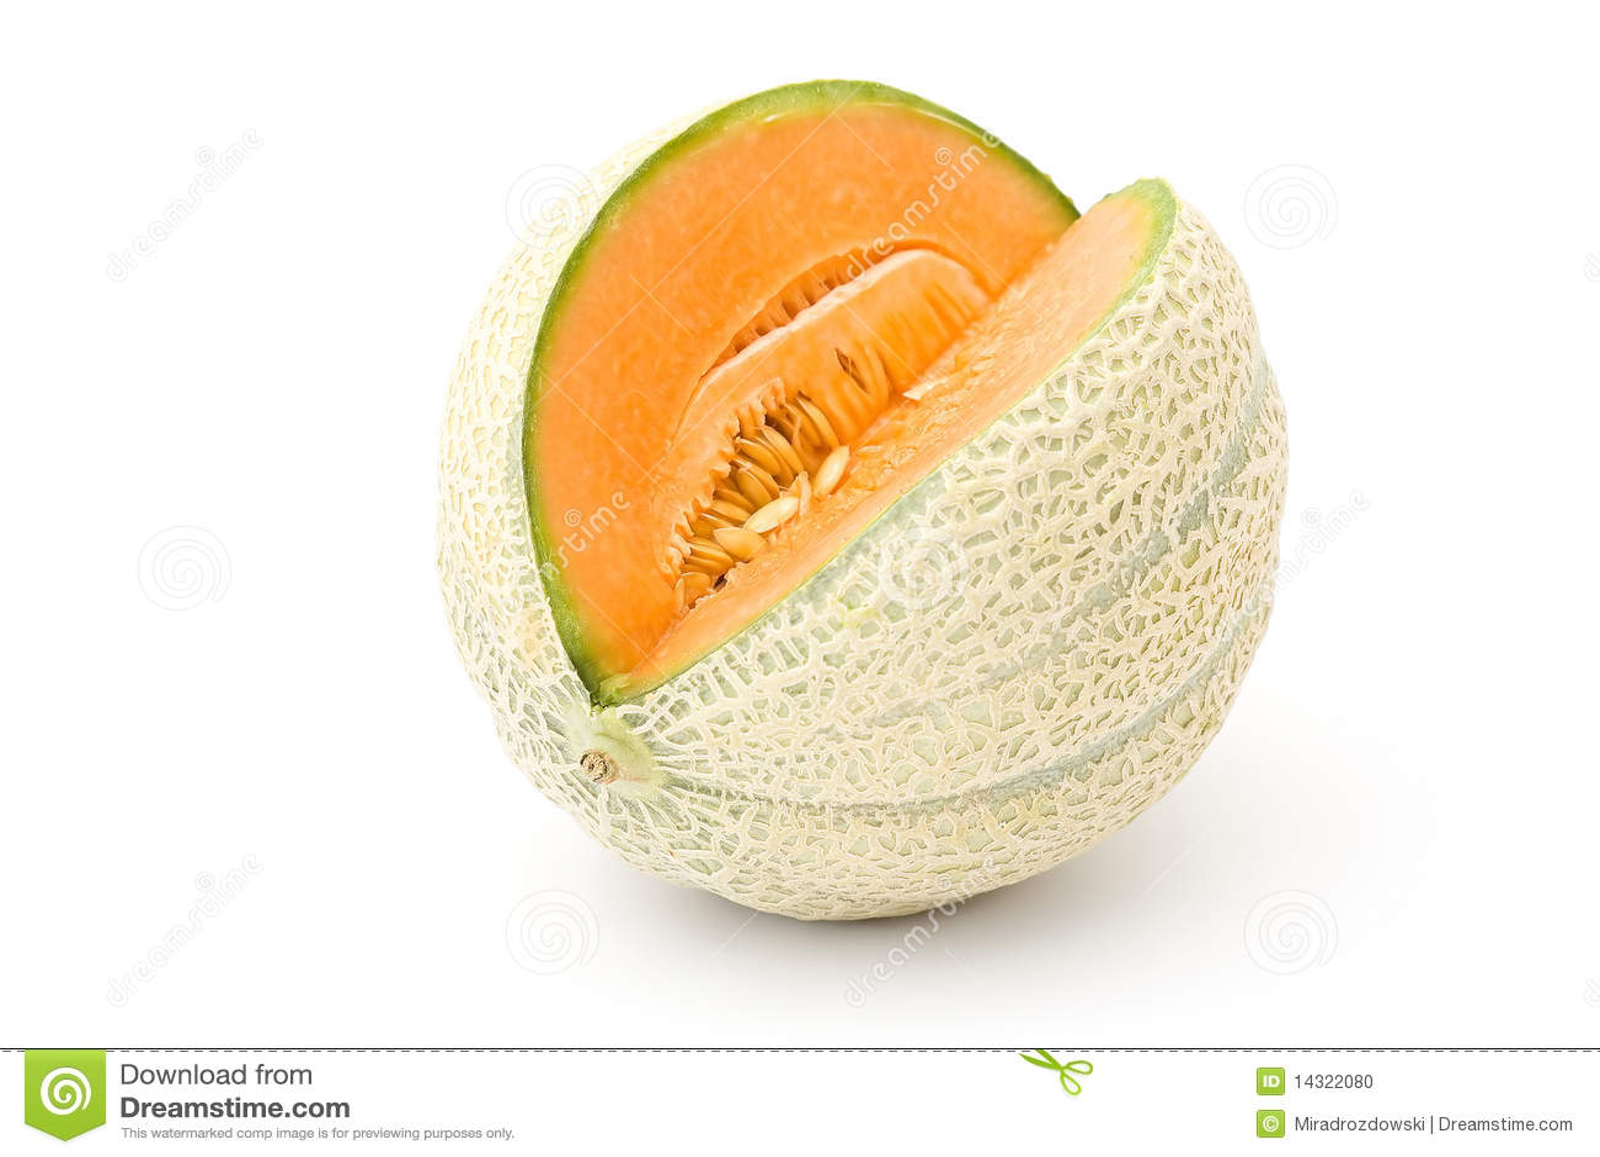 how to choose a cantaloupe melon